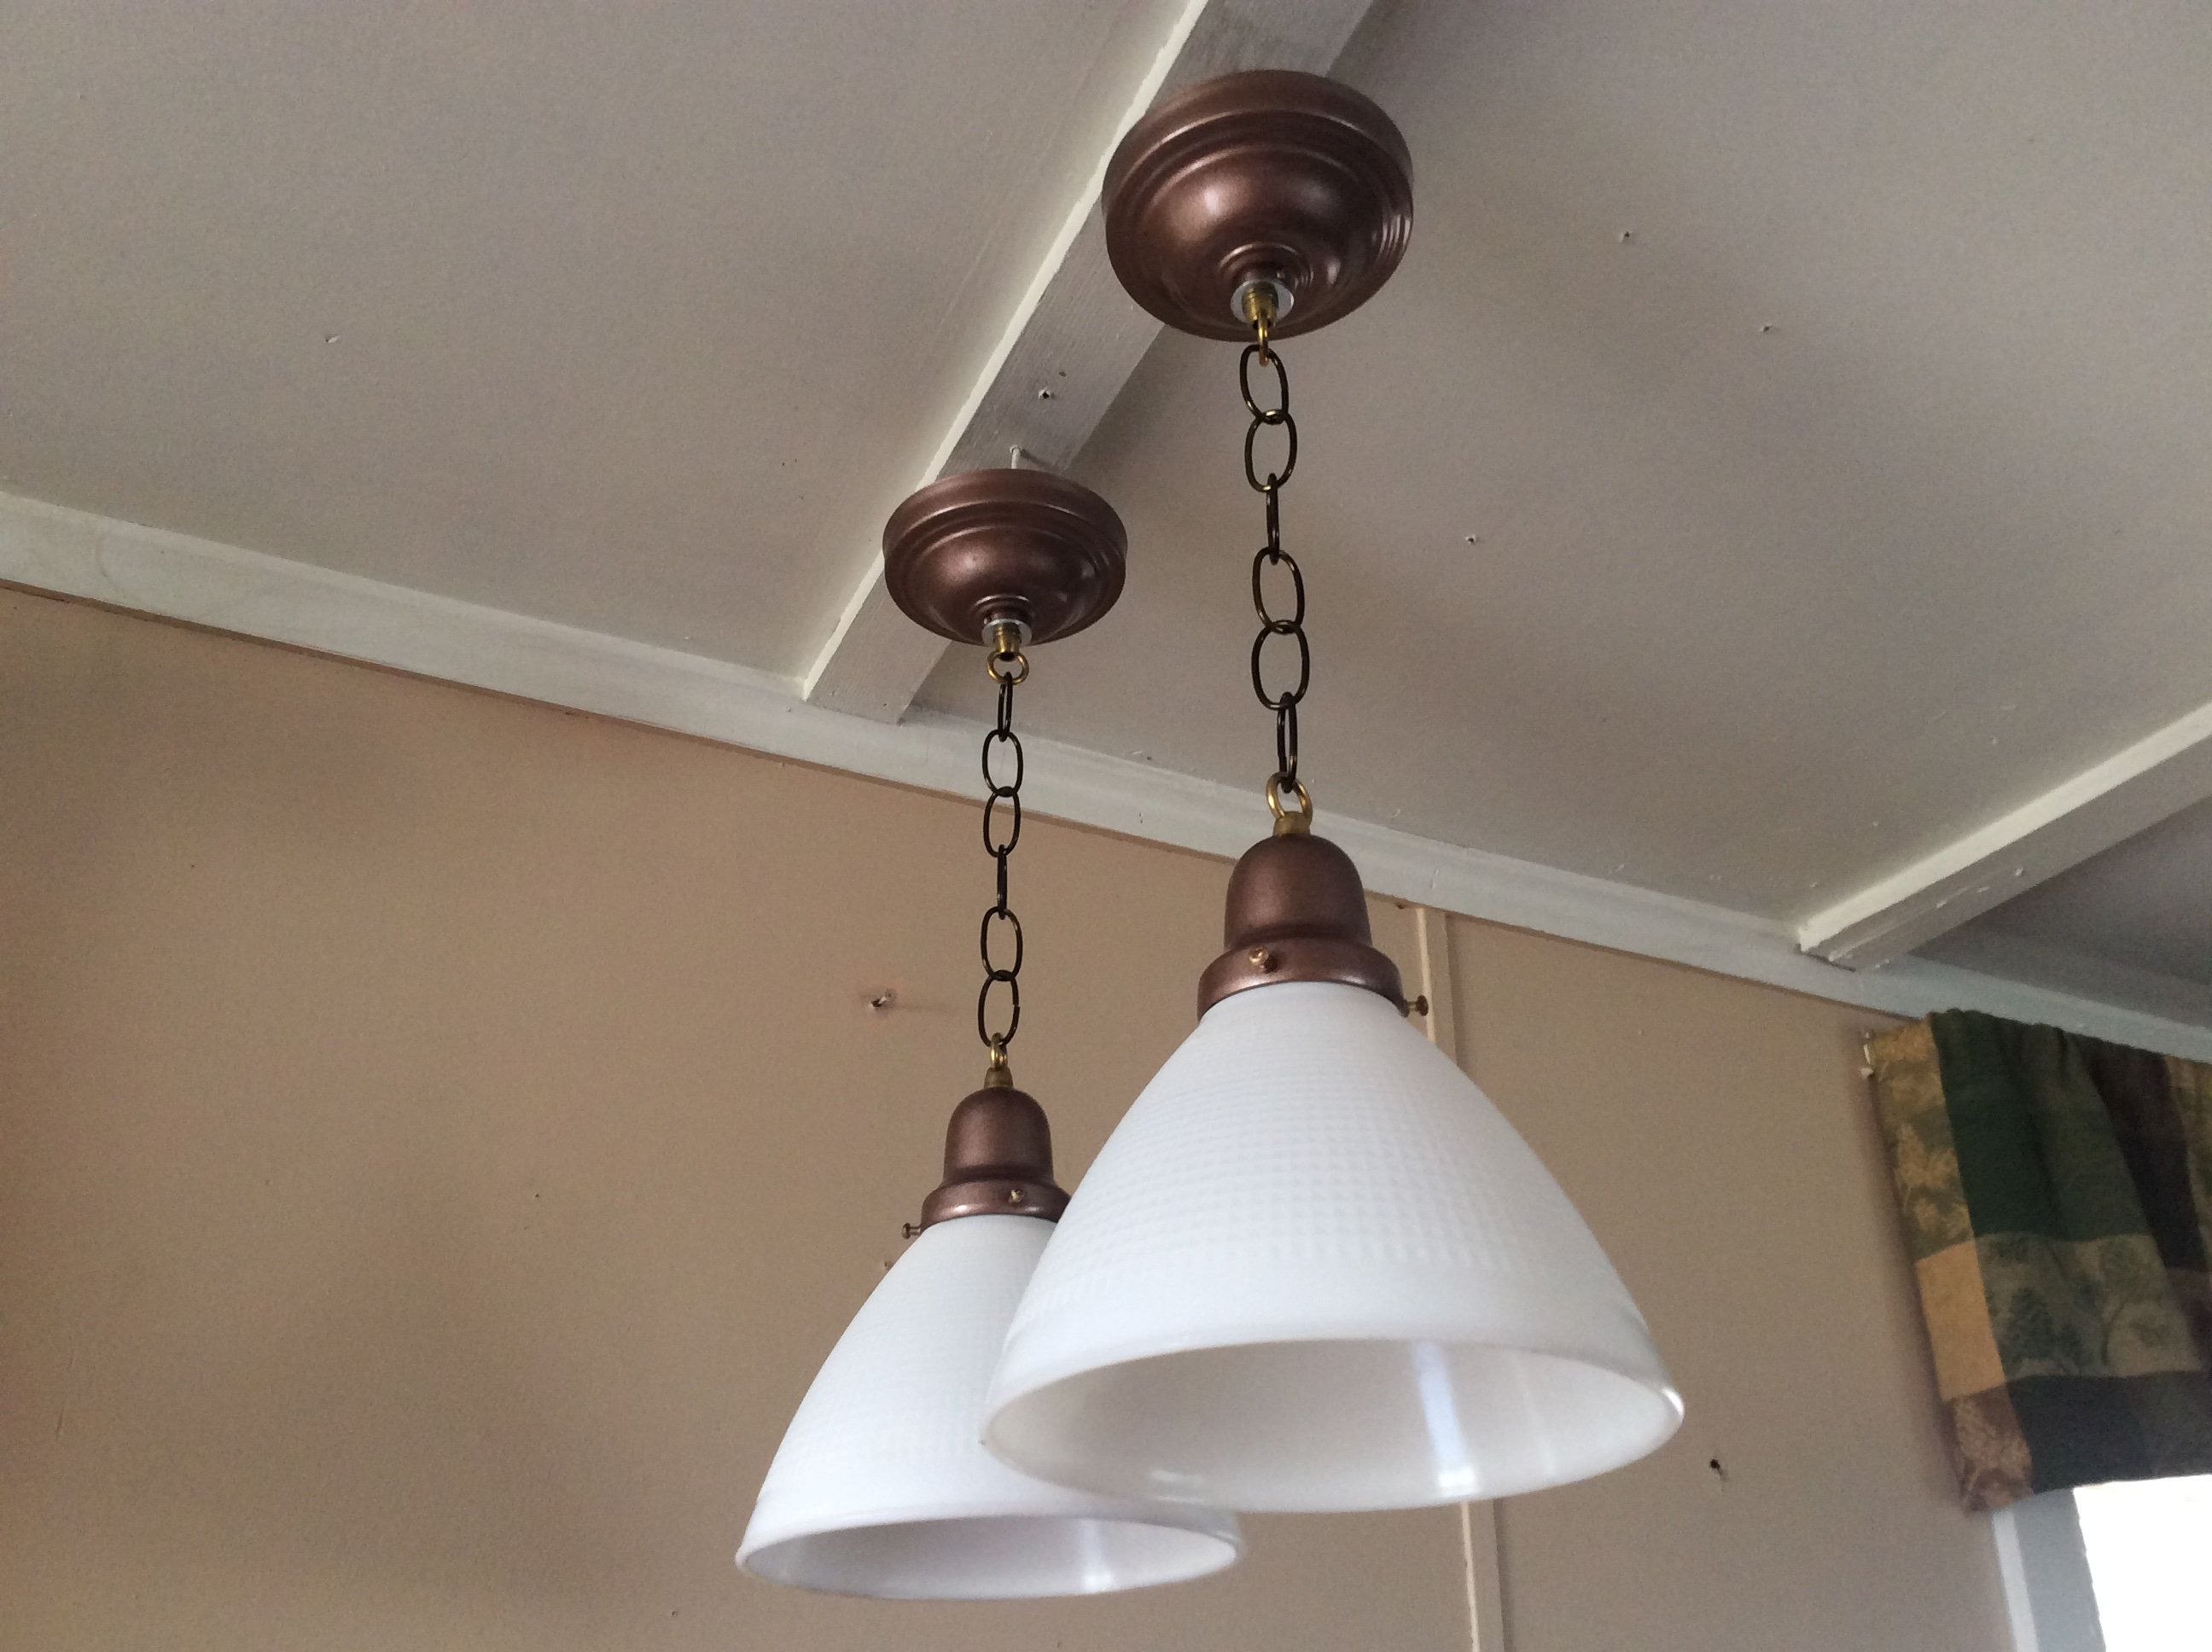 Vintage Pair Of Milk Glass Pendant Lights 1930s Industrial Conical Glass Pendant Light Antique Lighting Glass Lighting